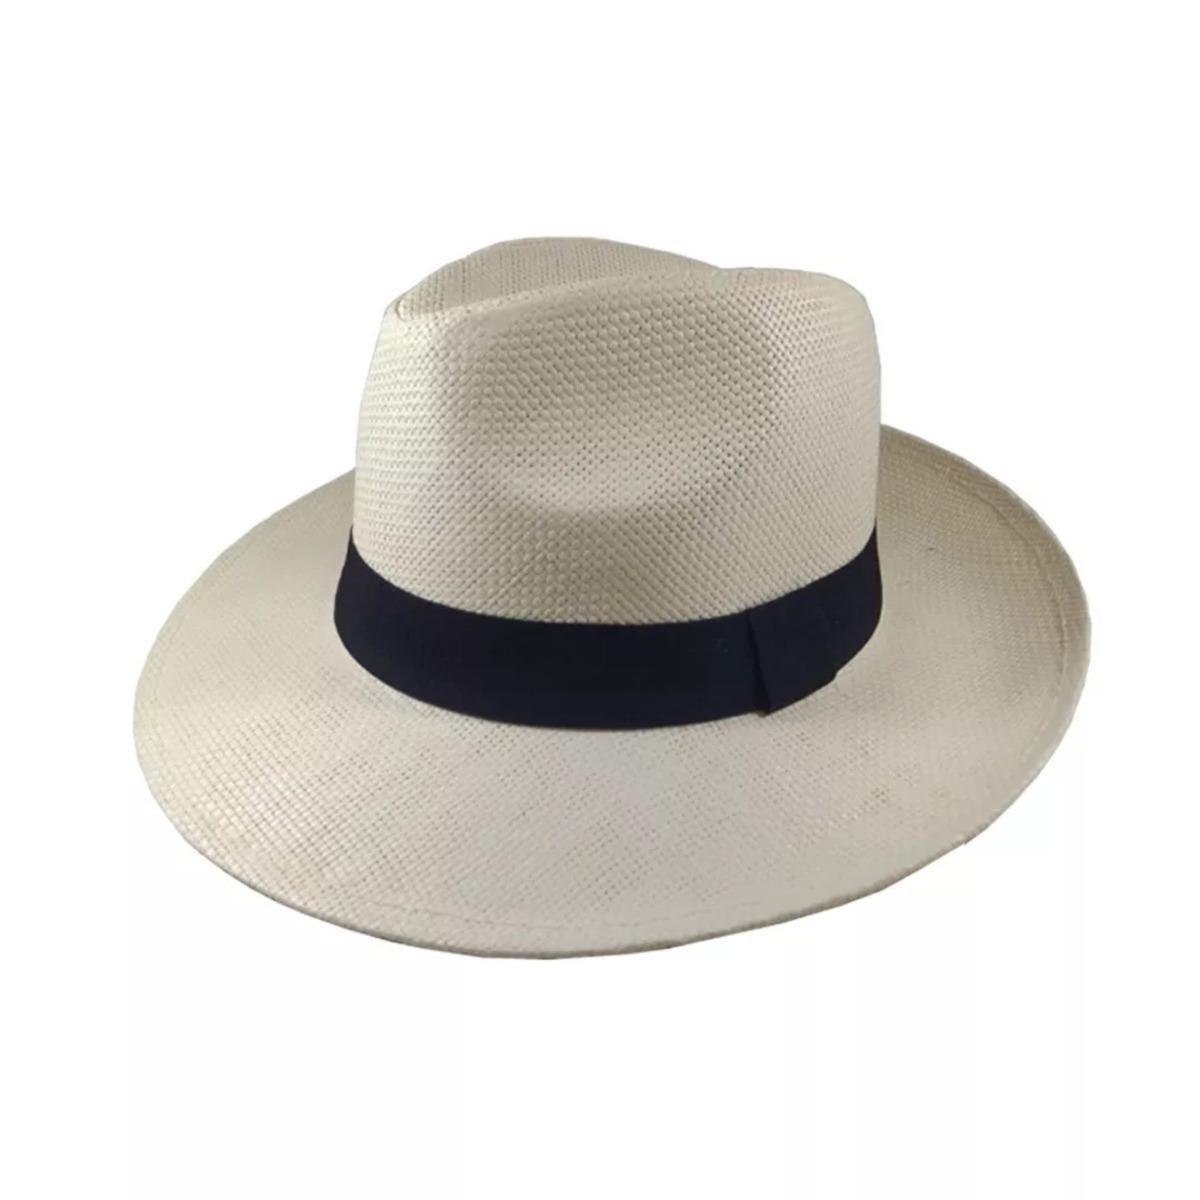 5641477077786 chapéu moda panamá aba larga clássico masculino feminino. Carregando zoom.